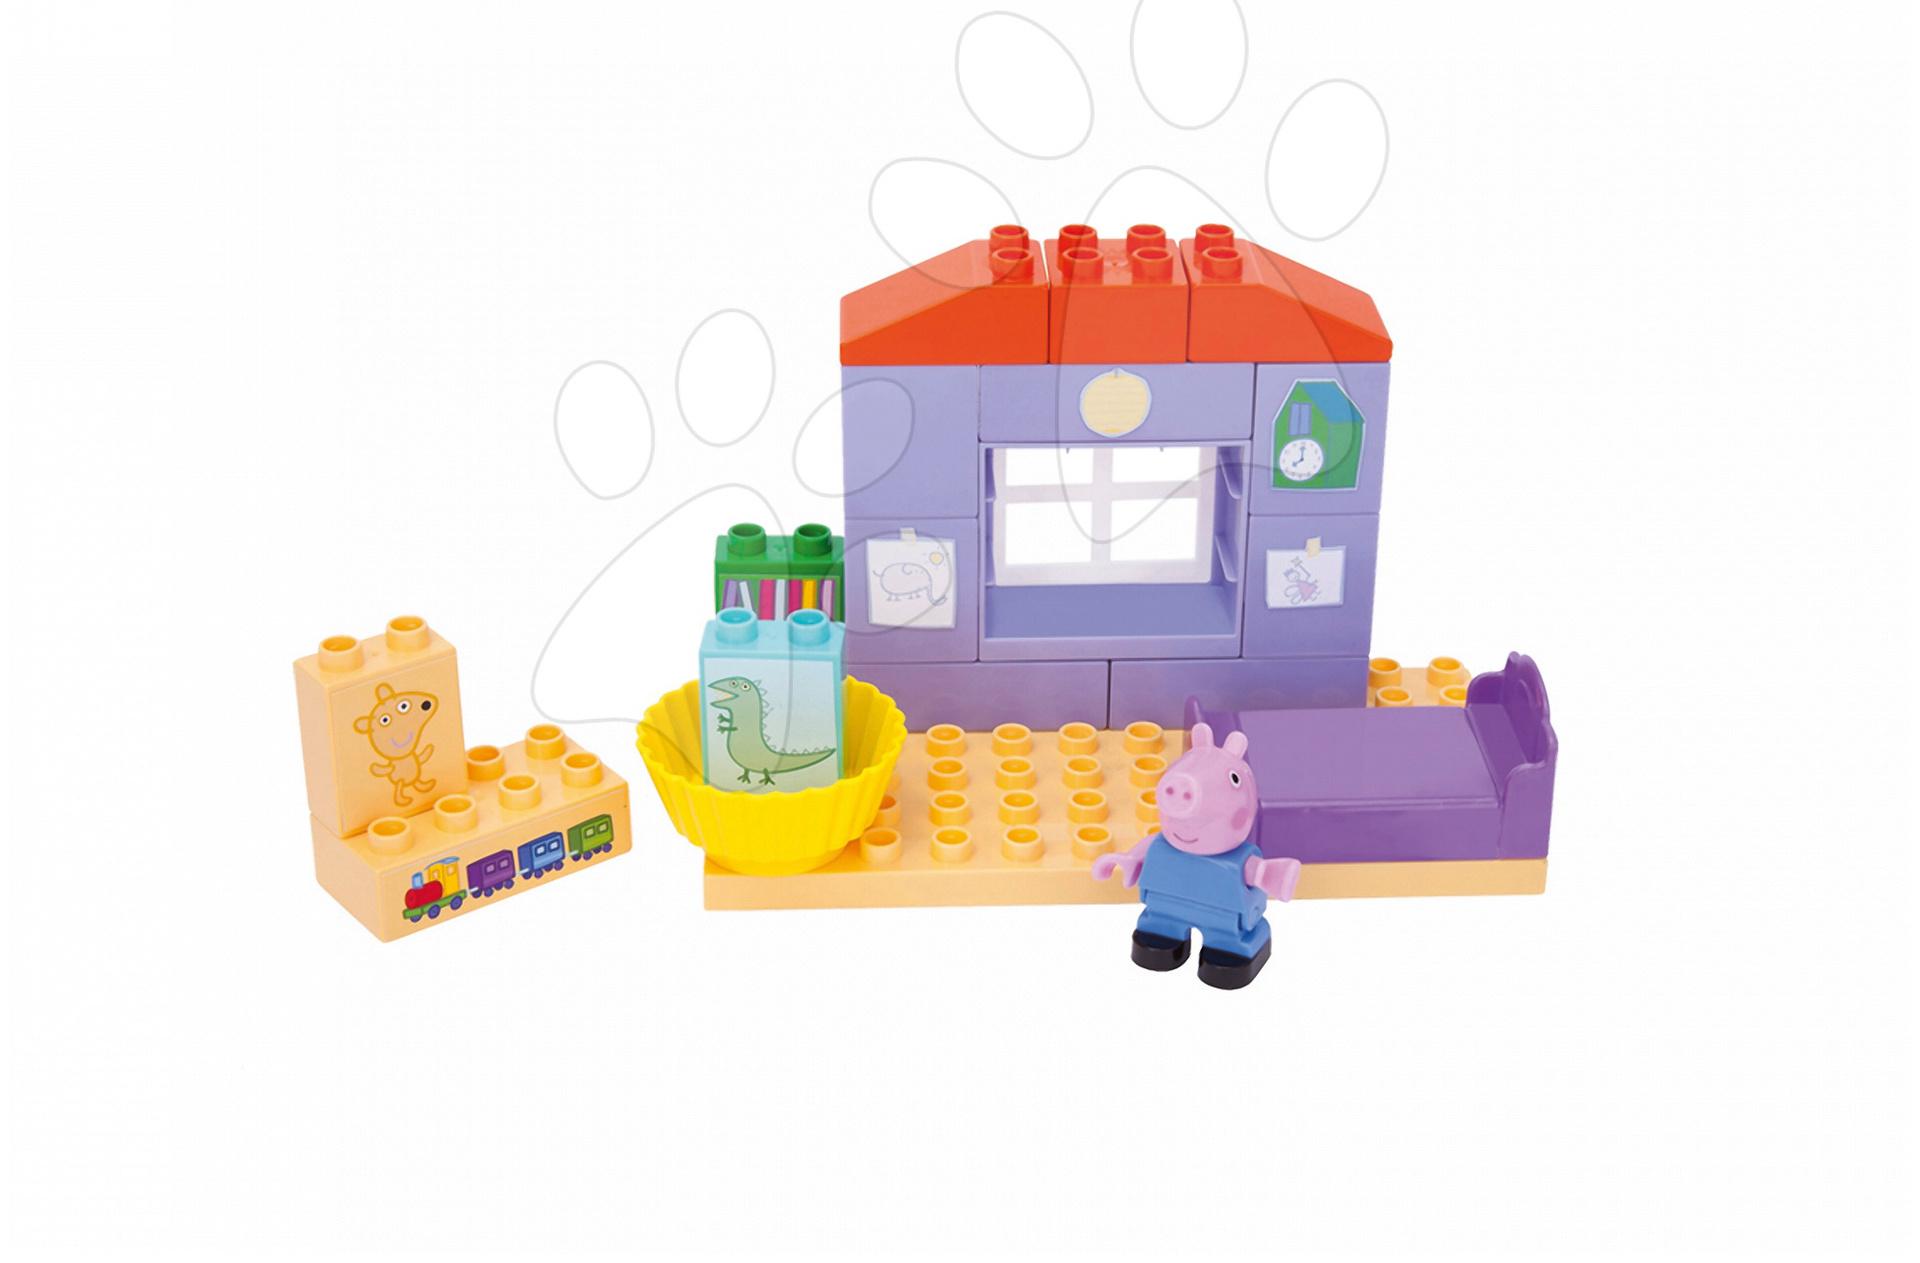 BIG stavebnica pre deti Peppa Pig v spálni PlayBIG Bloxx 57102-D